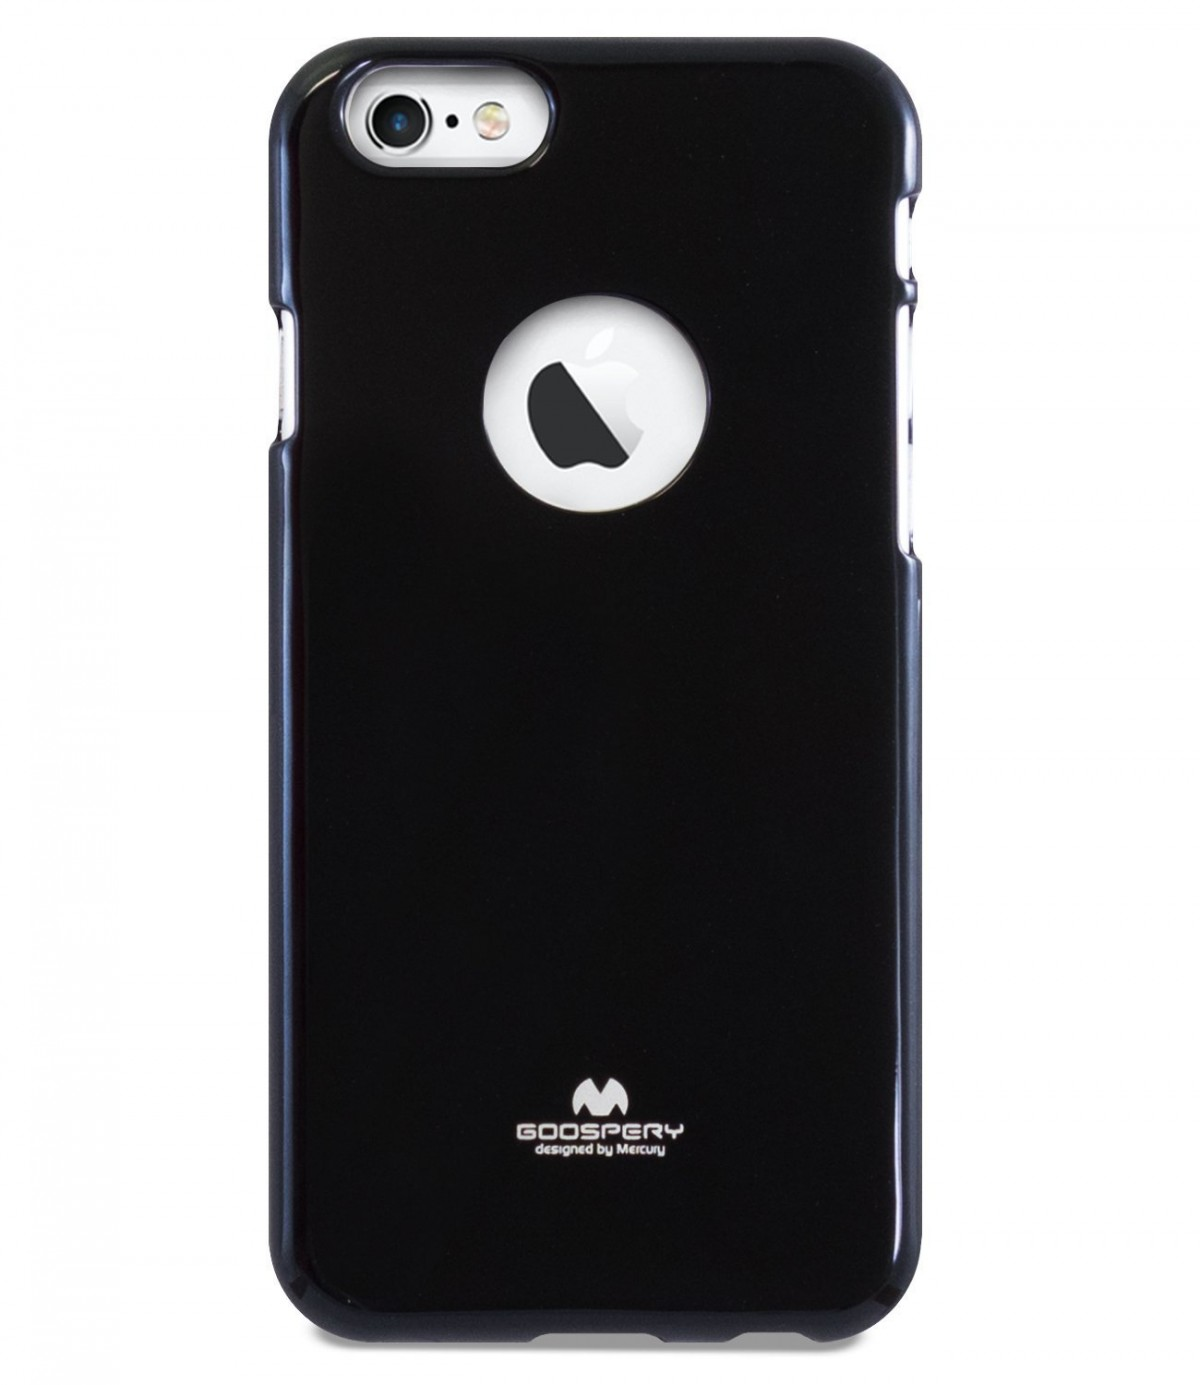 Tenké silikonové obaly / kryty Goospery Mercury pro Apple iPhone 6s/6 - Černý / Jet Black